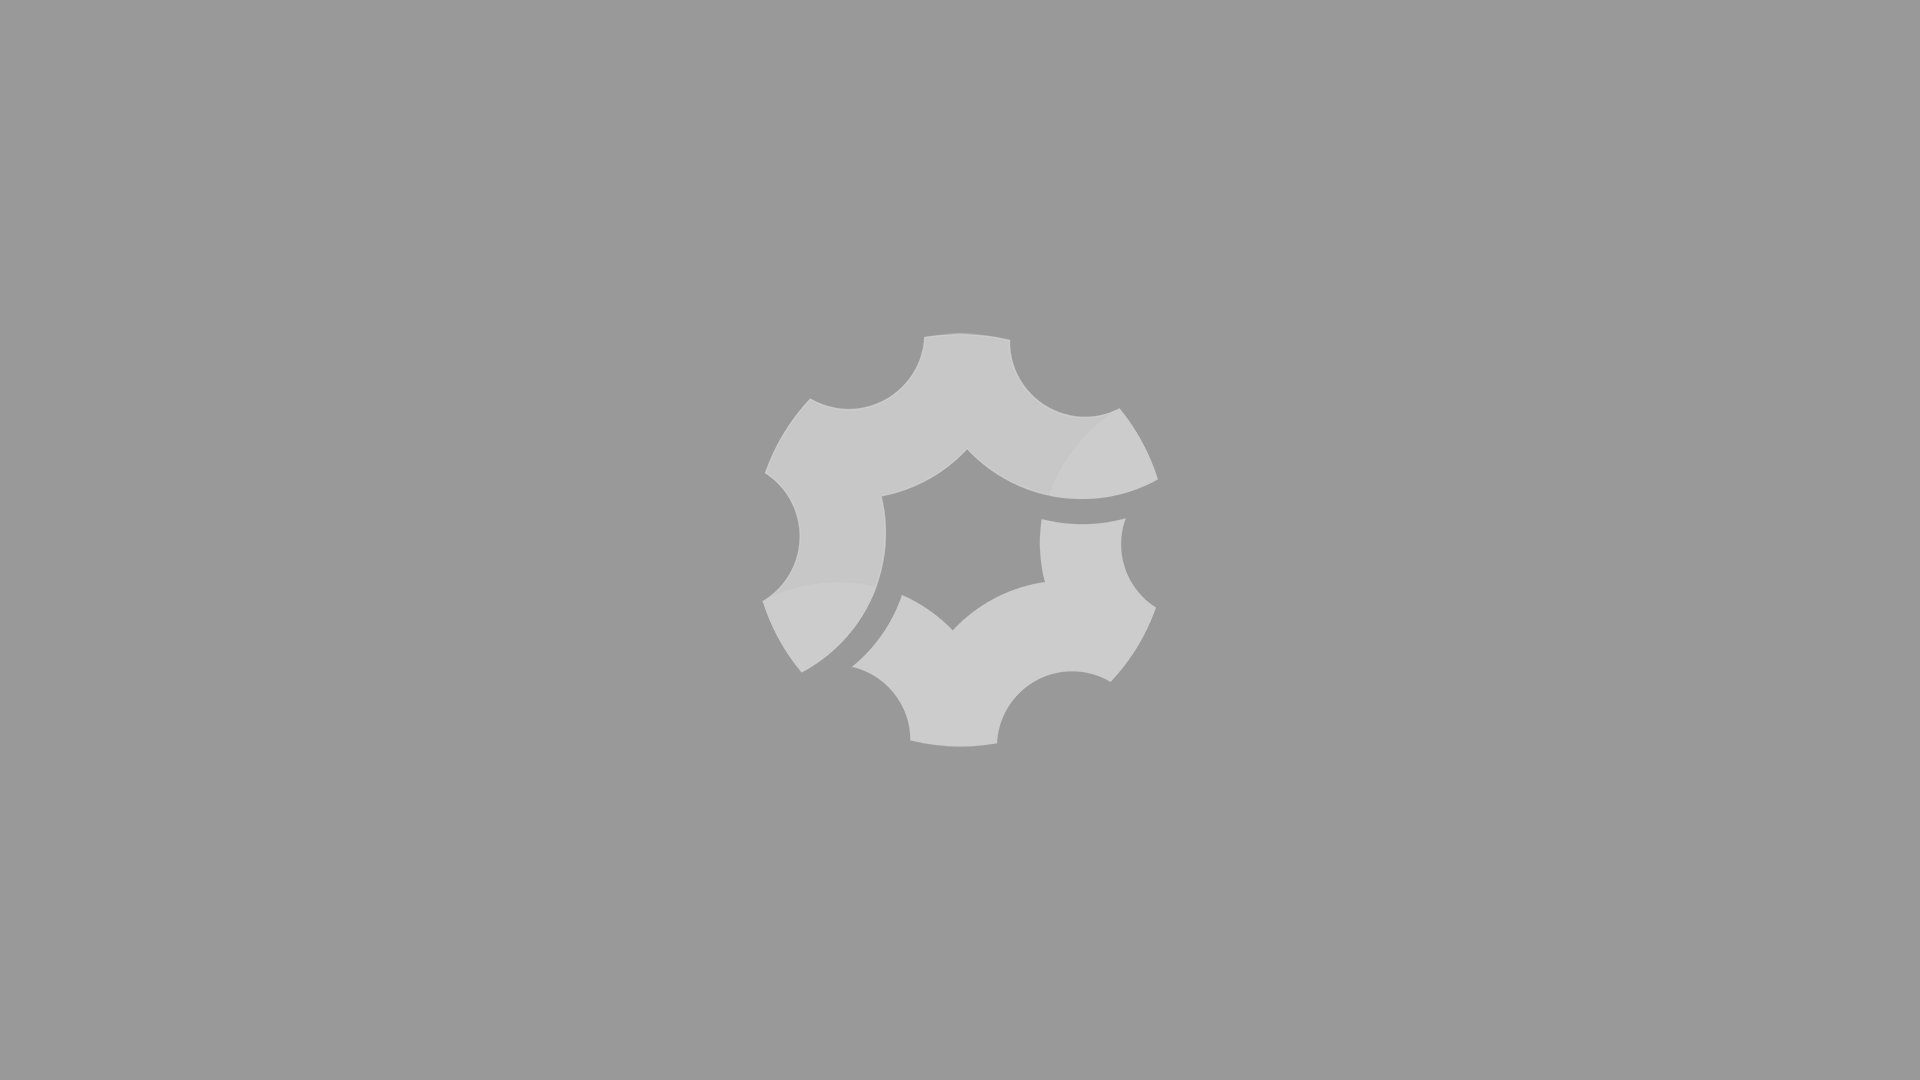 new_bitmap_image.1.jpg